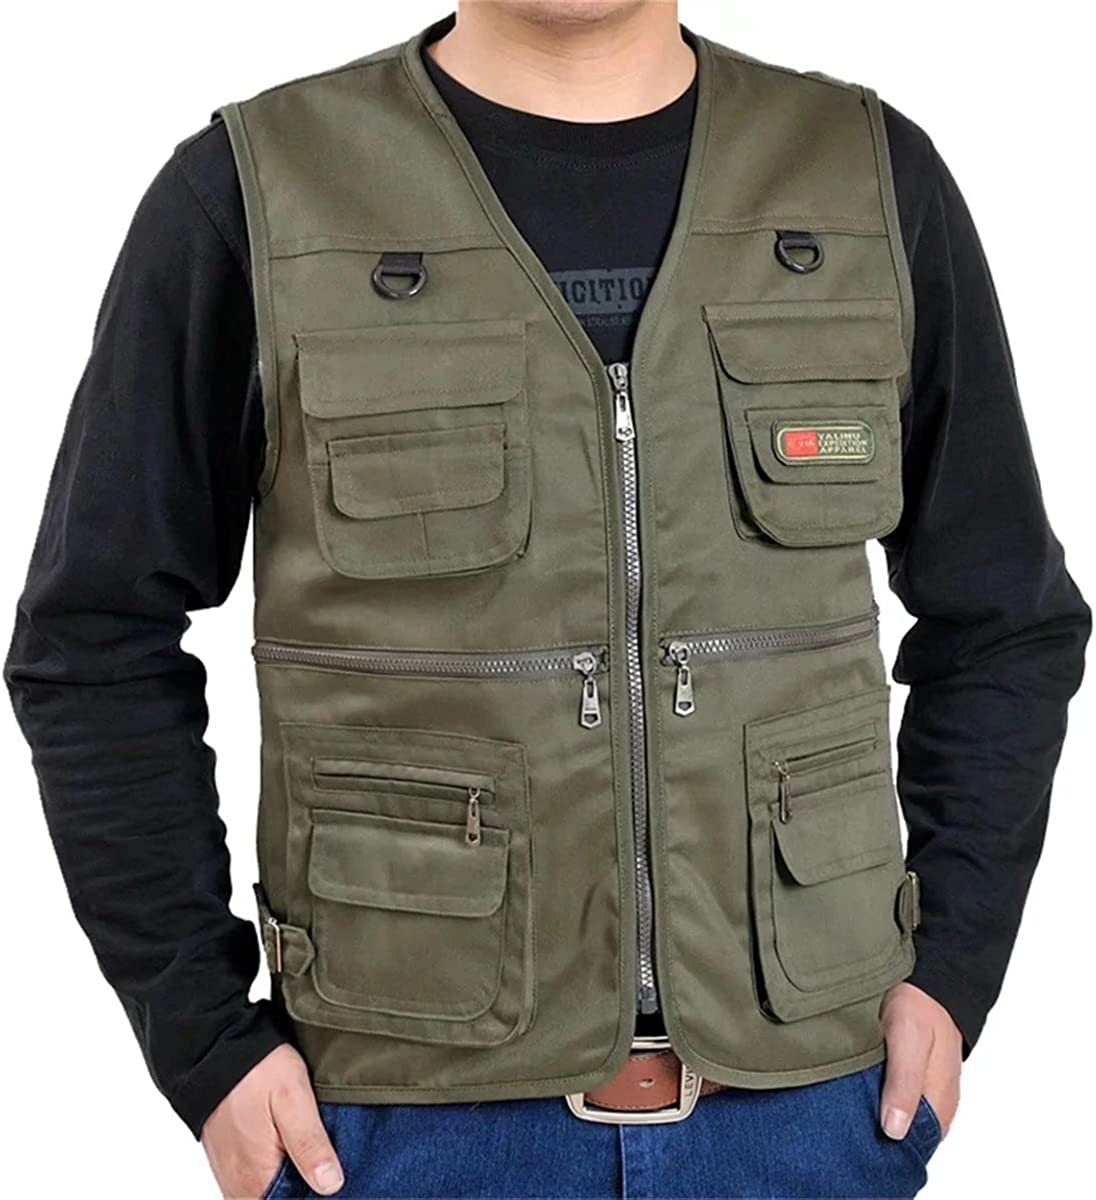 Mioubeila Men's Camouflage Cargo Vest With Zipper